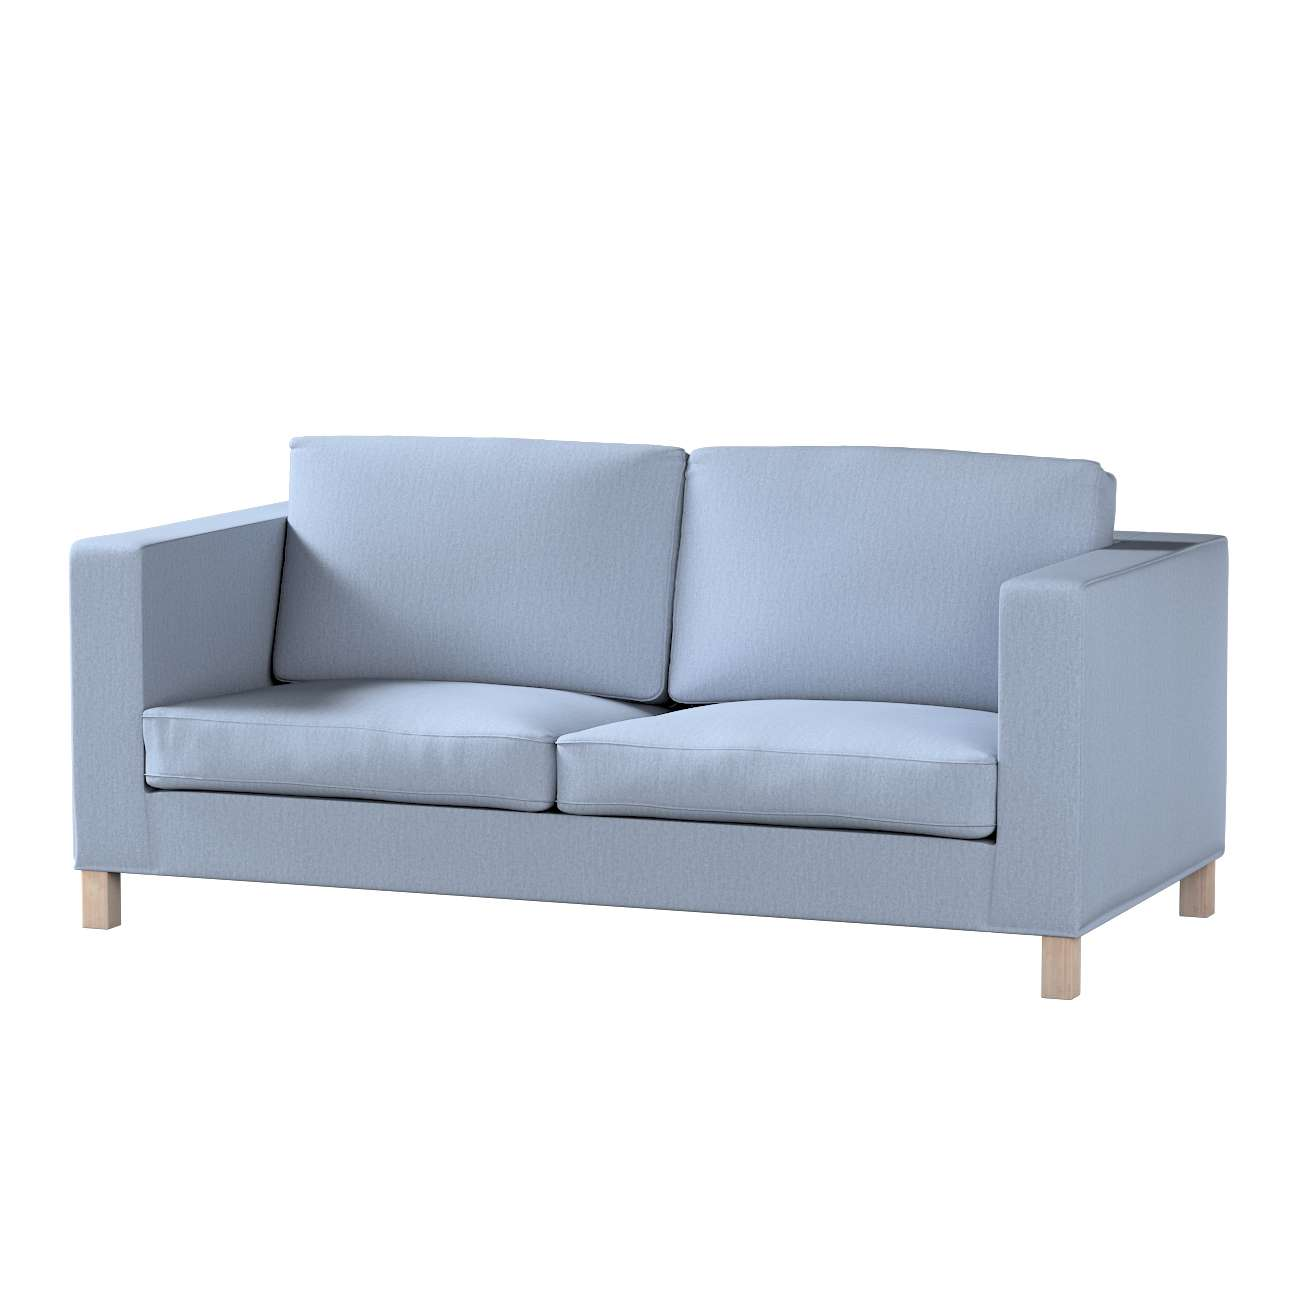 Blauwe Ikea Slaapbank.Ikea Zitbankhoes Overtrek Voor Karlanda Slaapbank Kort Zilver